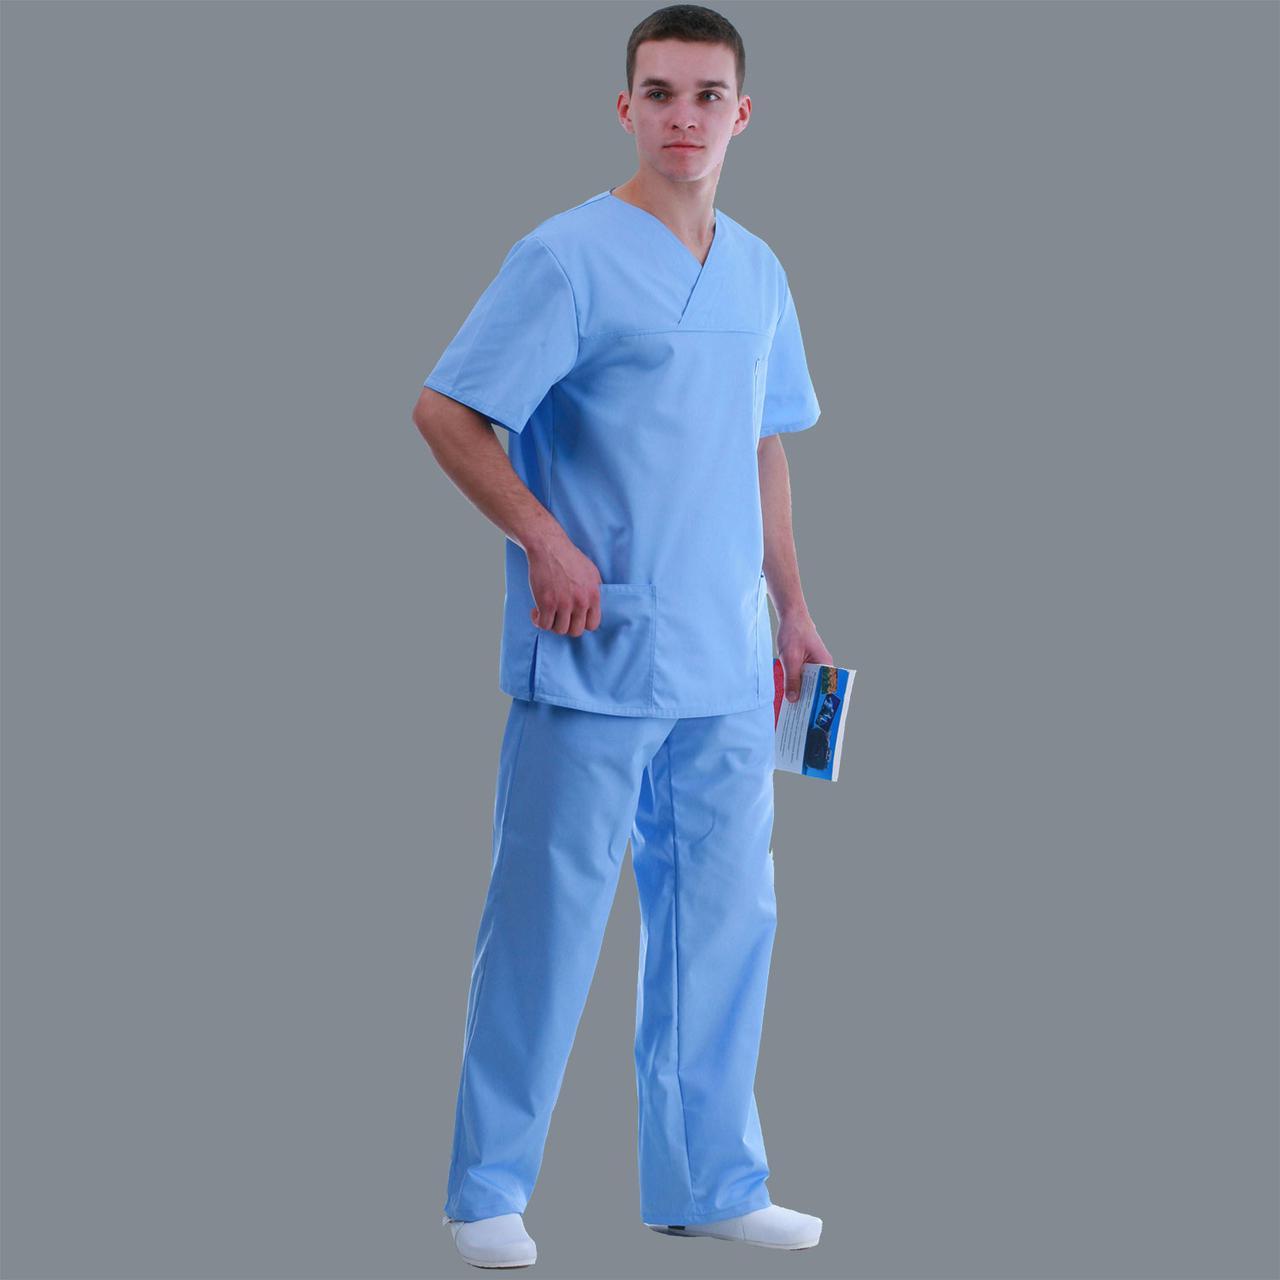 Медицинский мужской костюм Унисекс